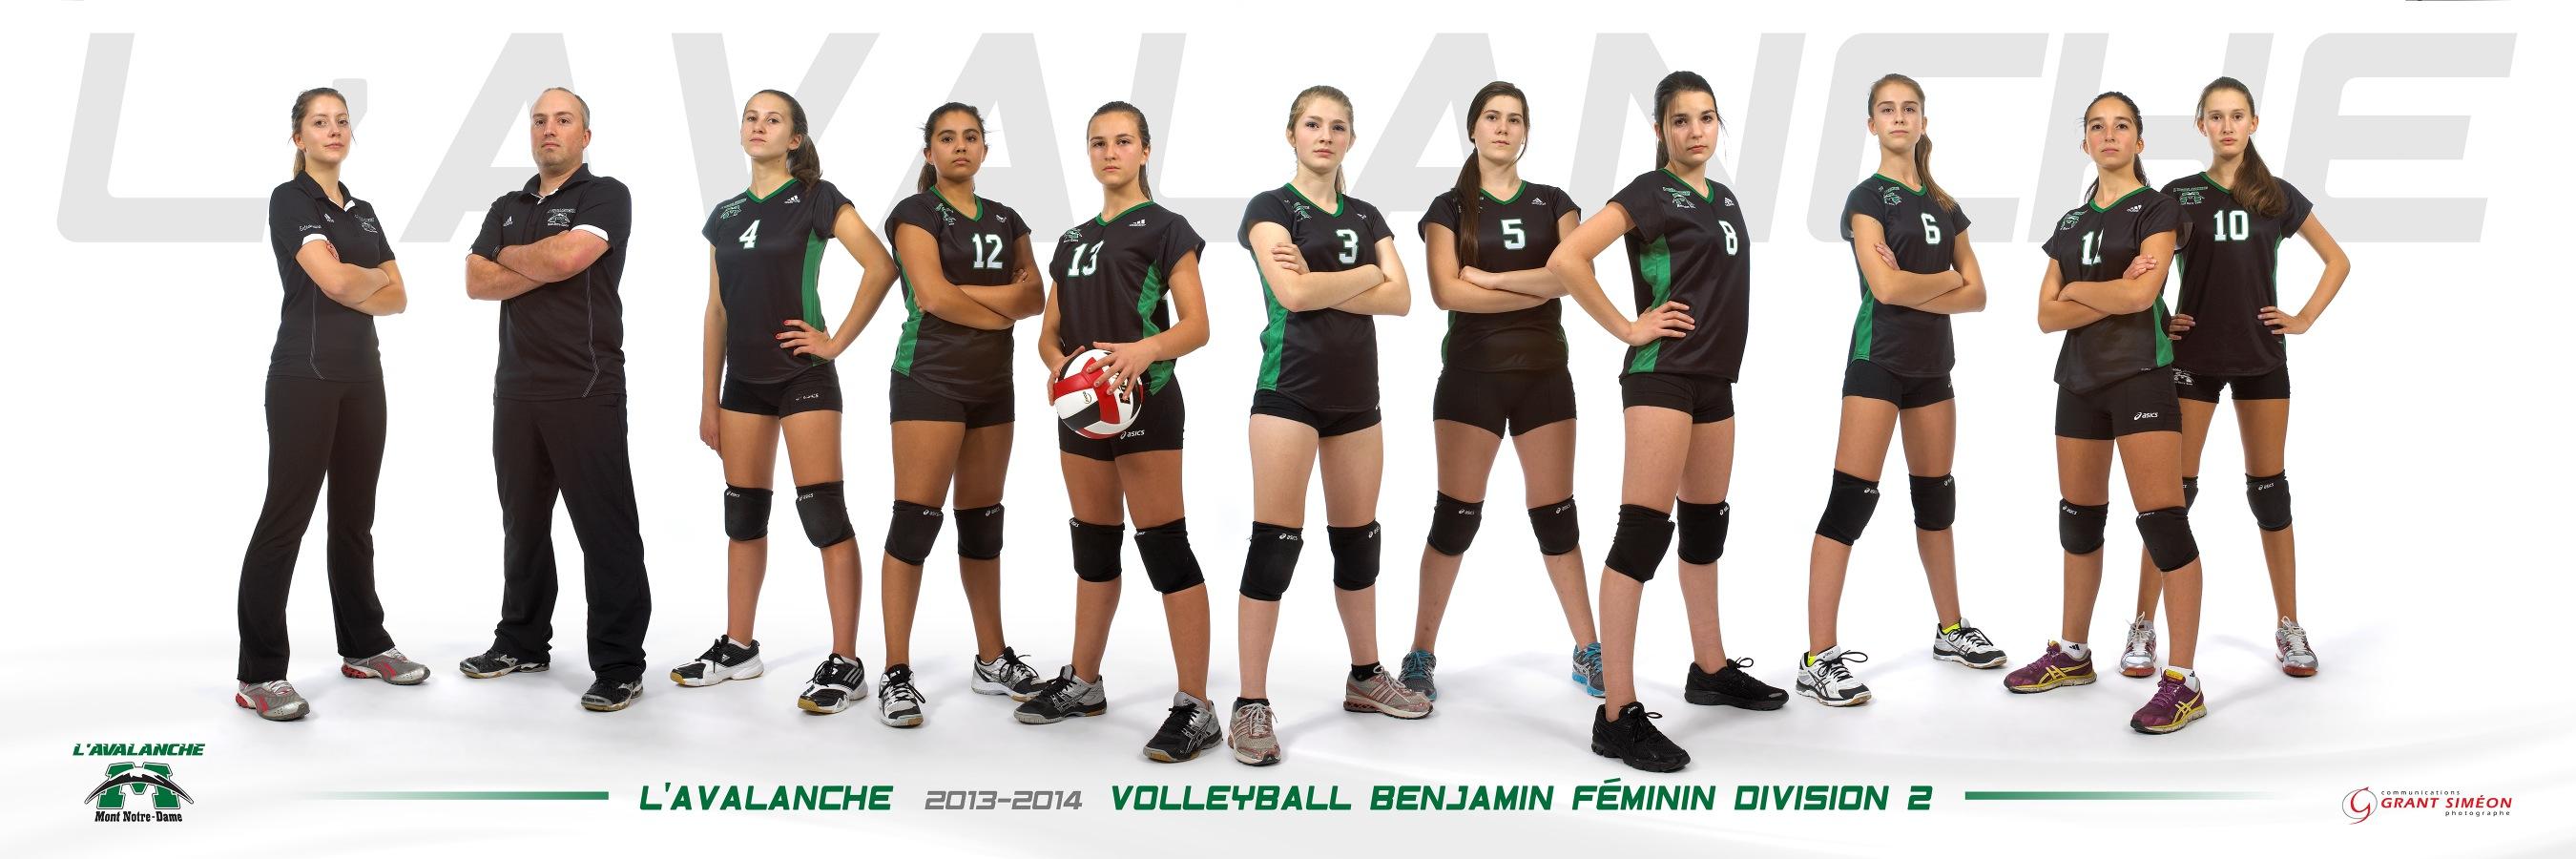 MND_volleyball-benjamine-div-2-2013-2014